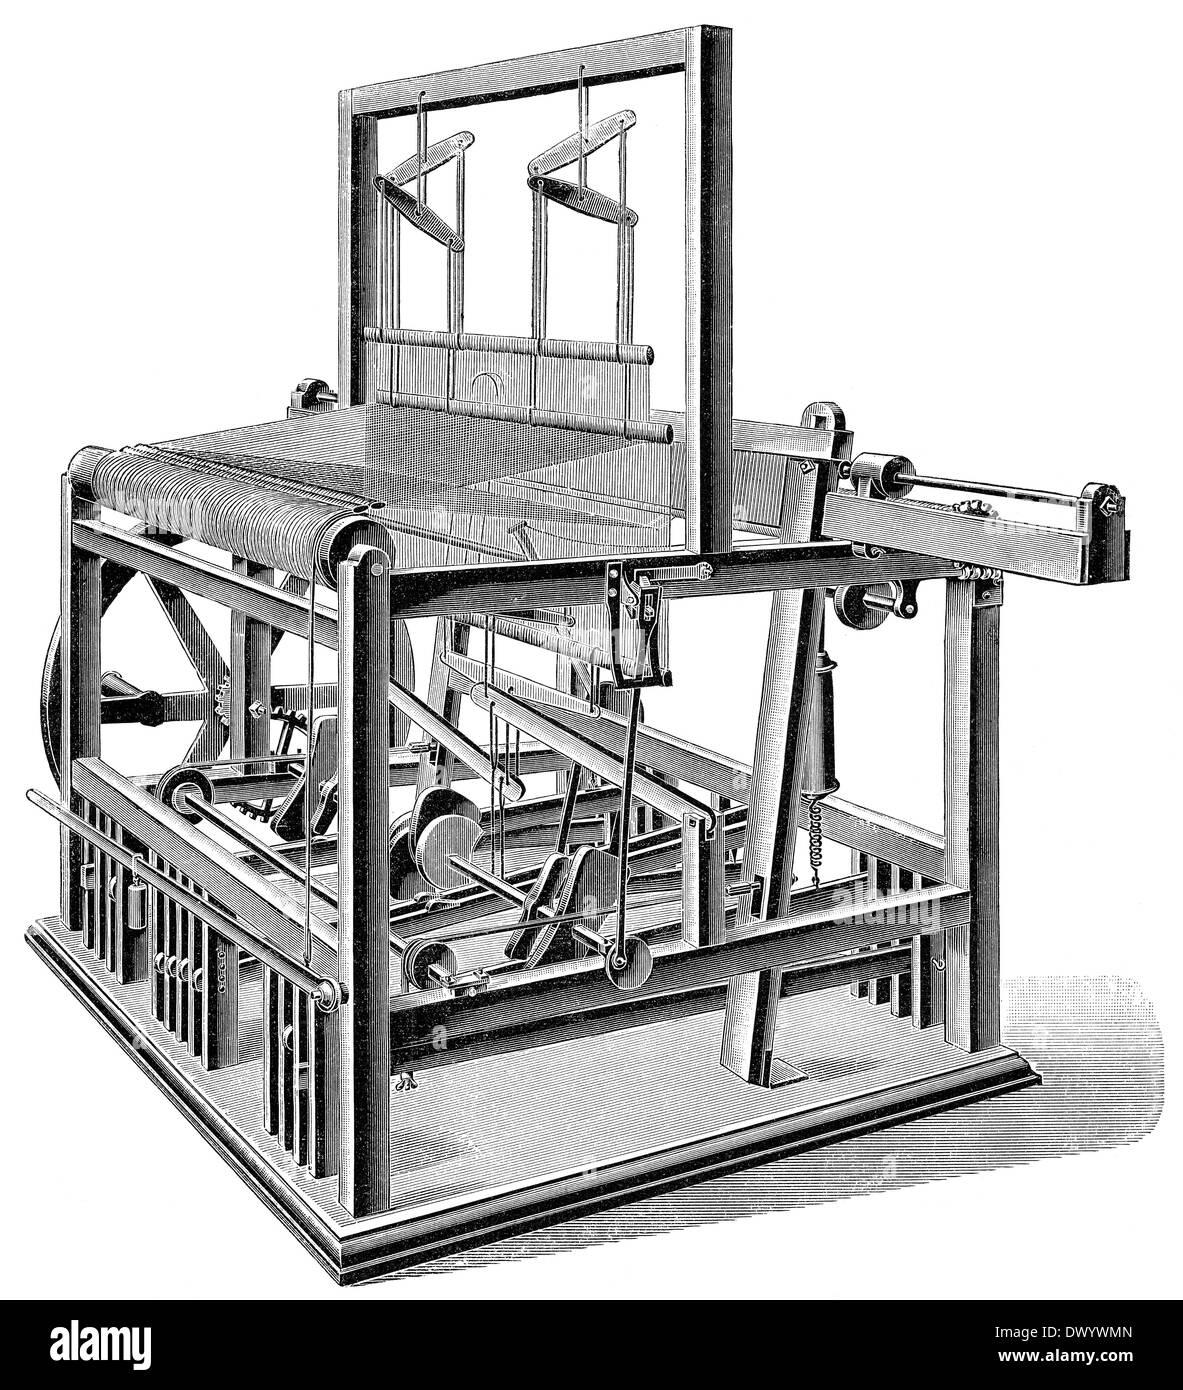 mechanical weaving loom, 19th century, - Stock Image